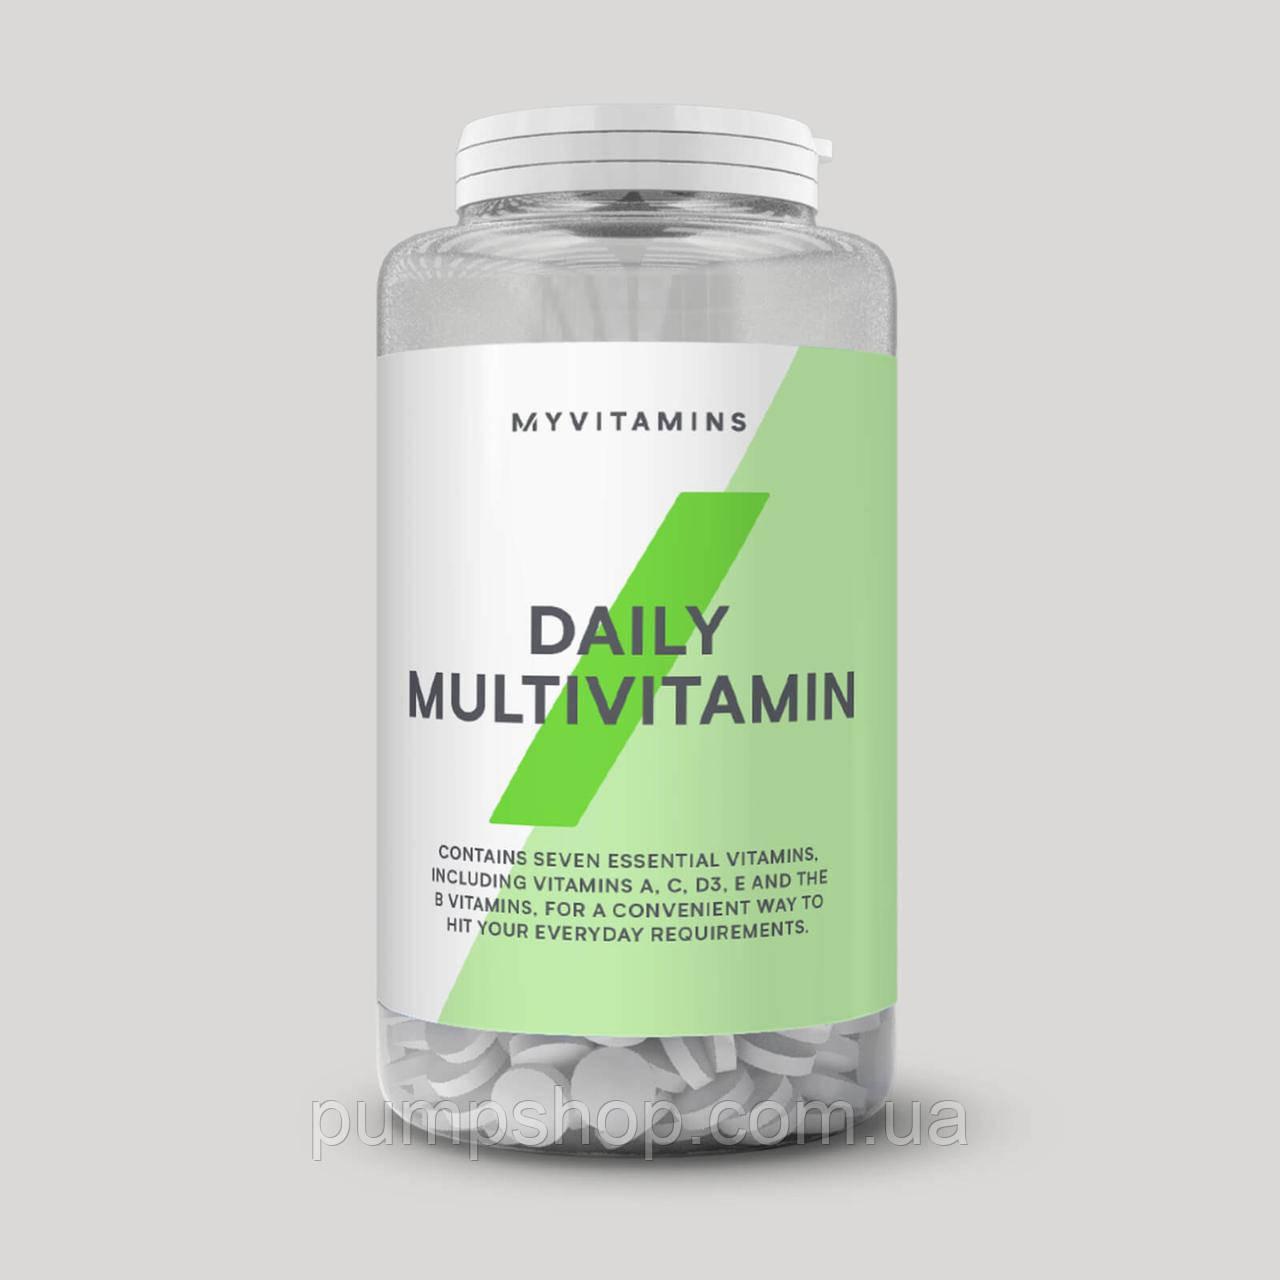 Мультивітаміни Myprotein Daily Multivitamins 60 таб.